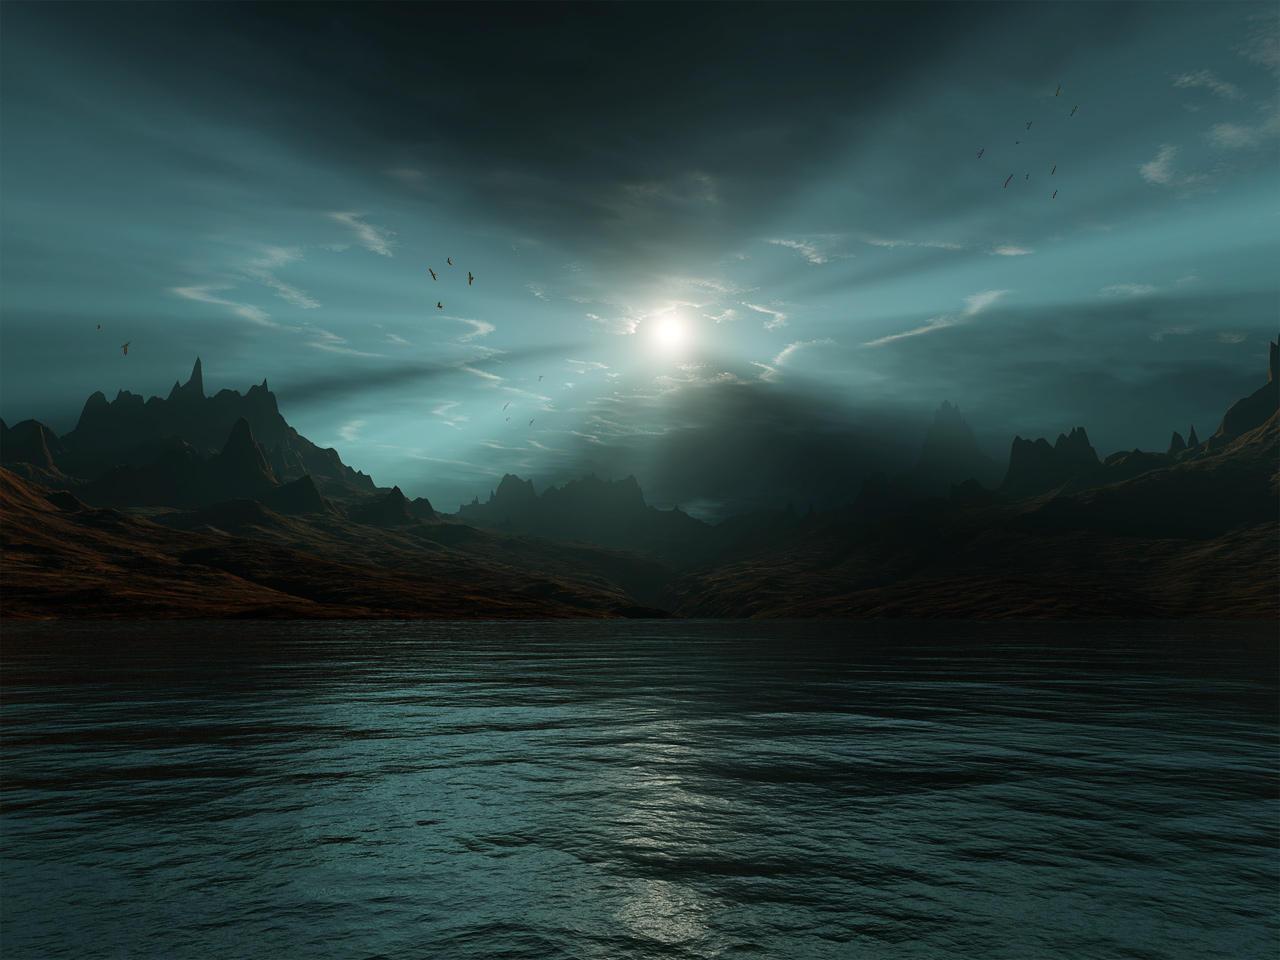 Darkening Mood by CrAzYmOnKeY